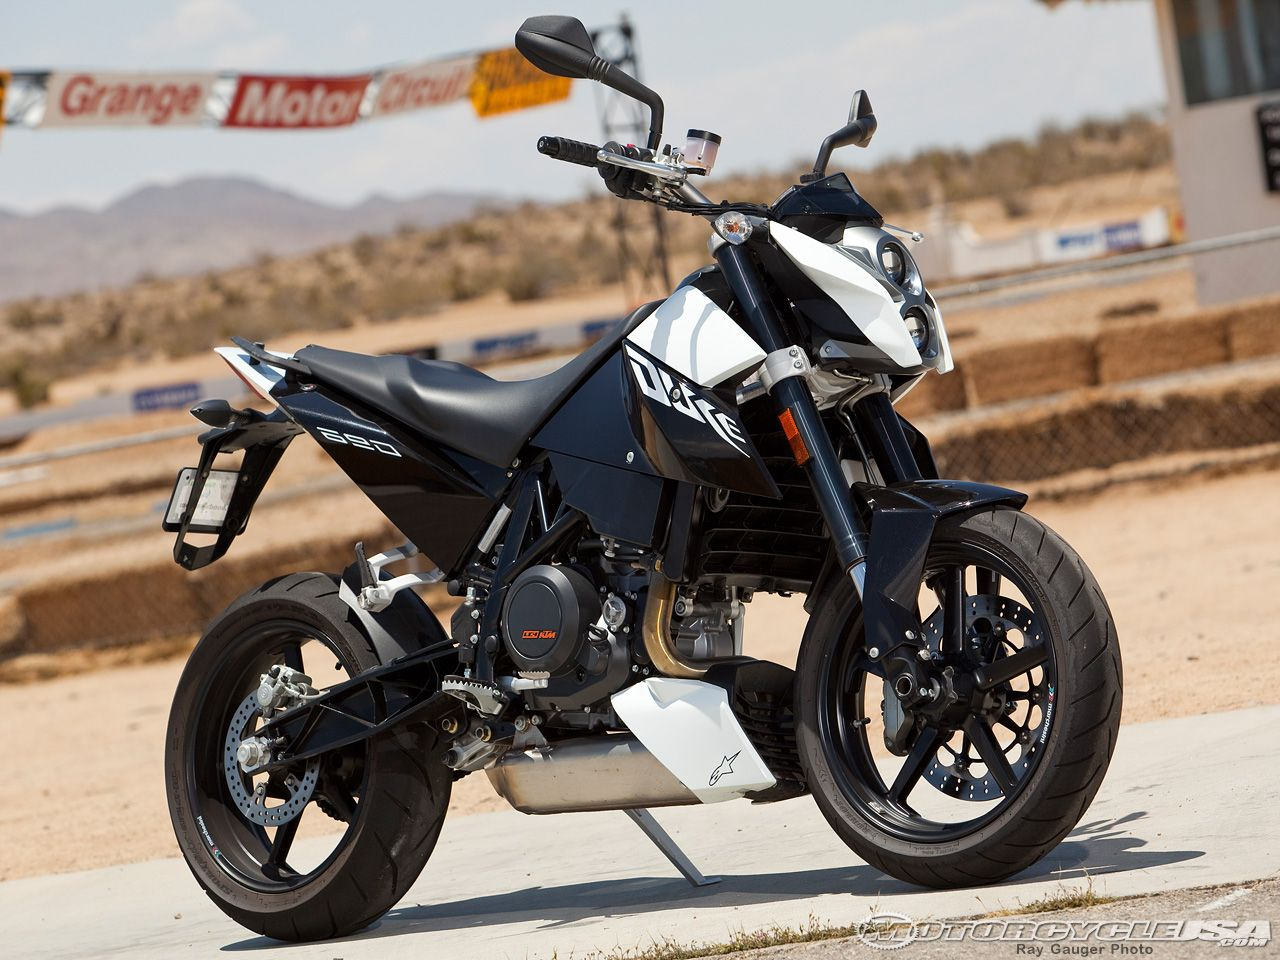 2010 KTM Duke 690 R First Look